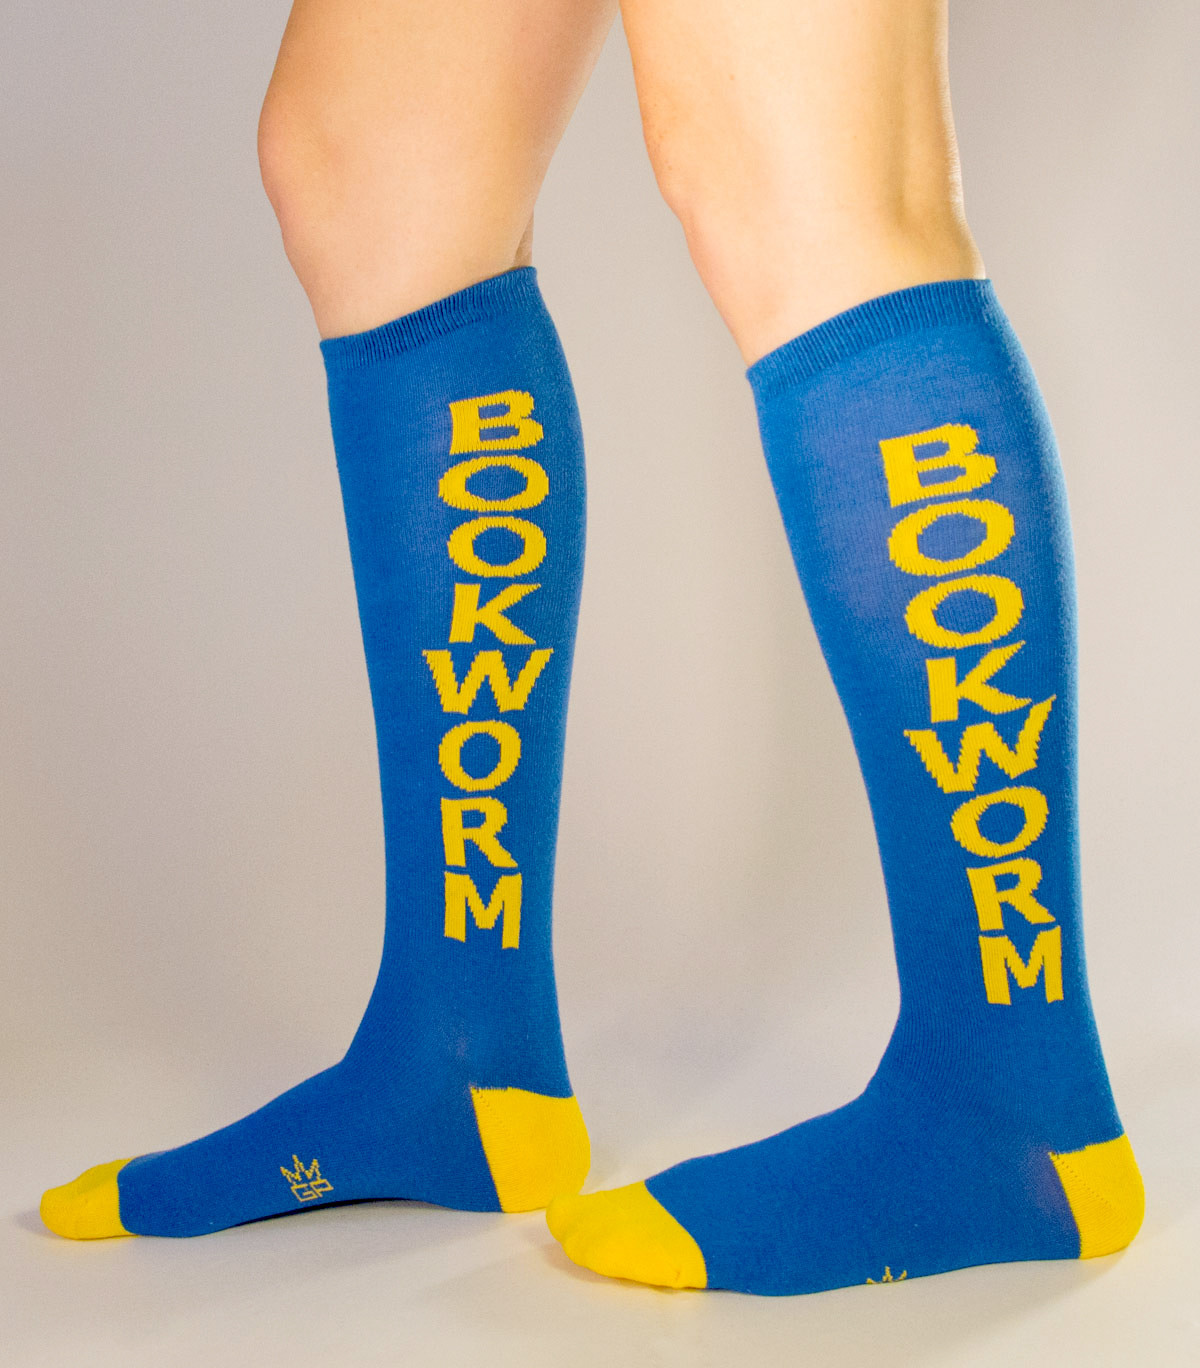 Bookworm Socks